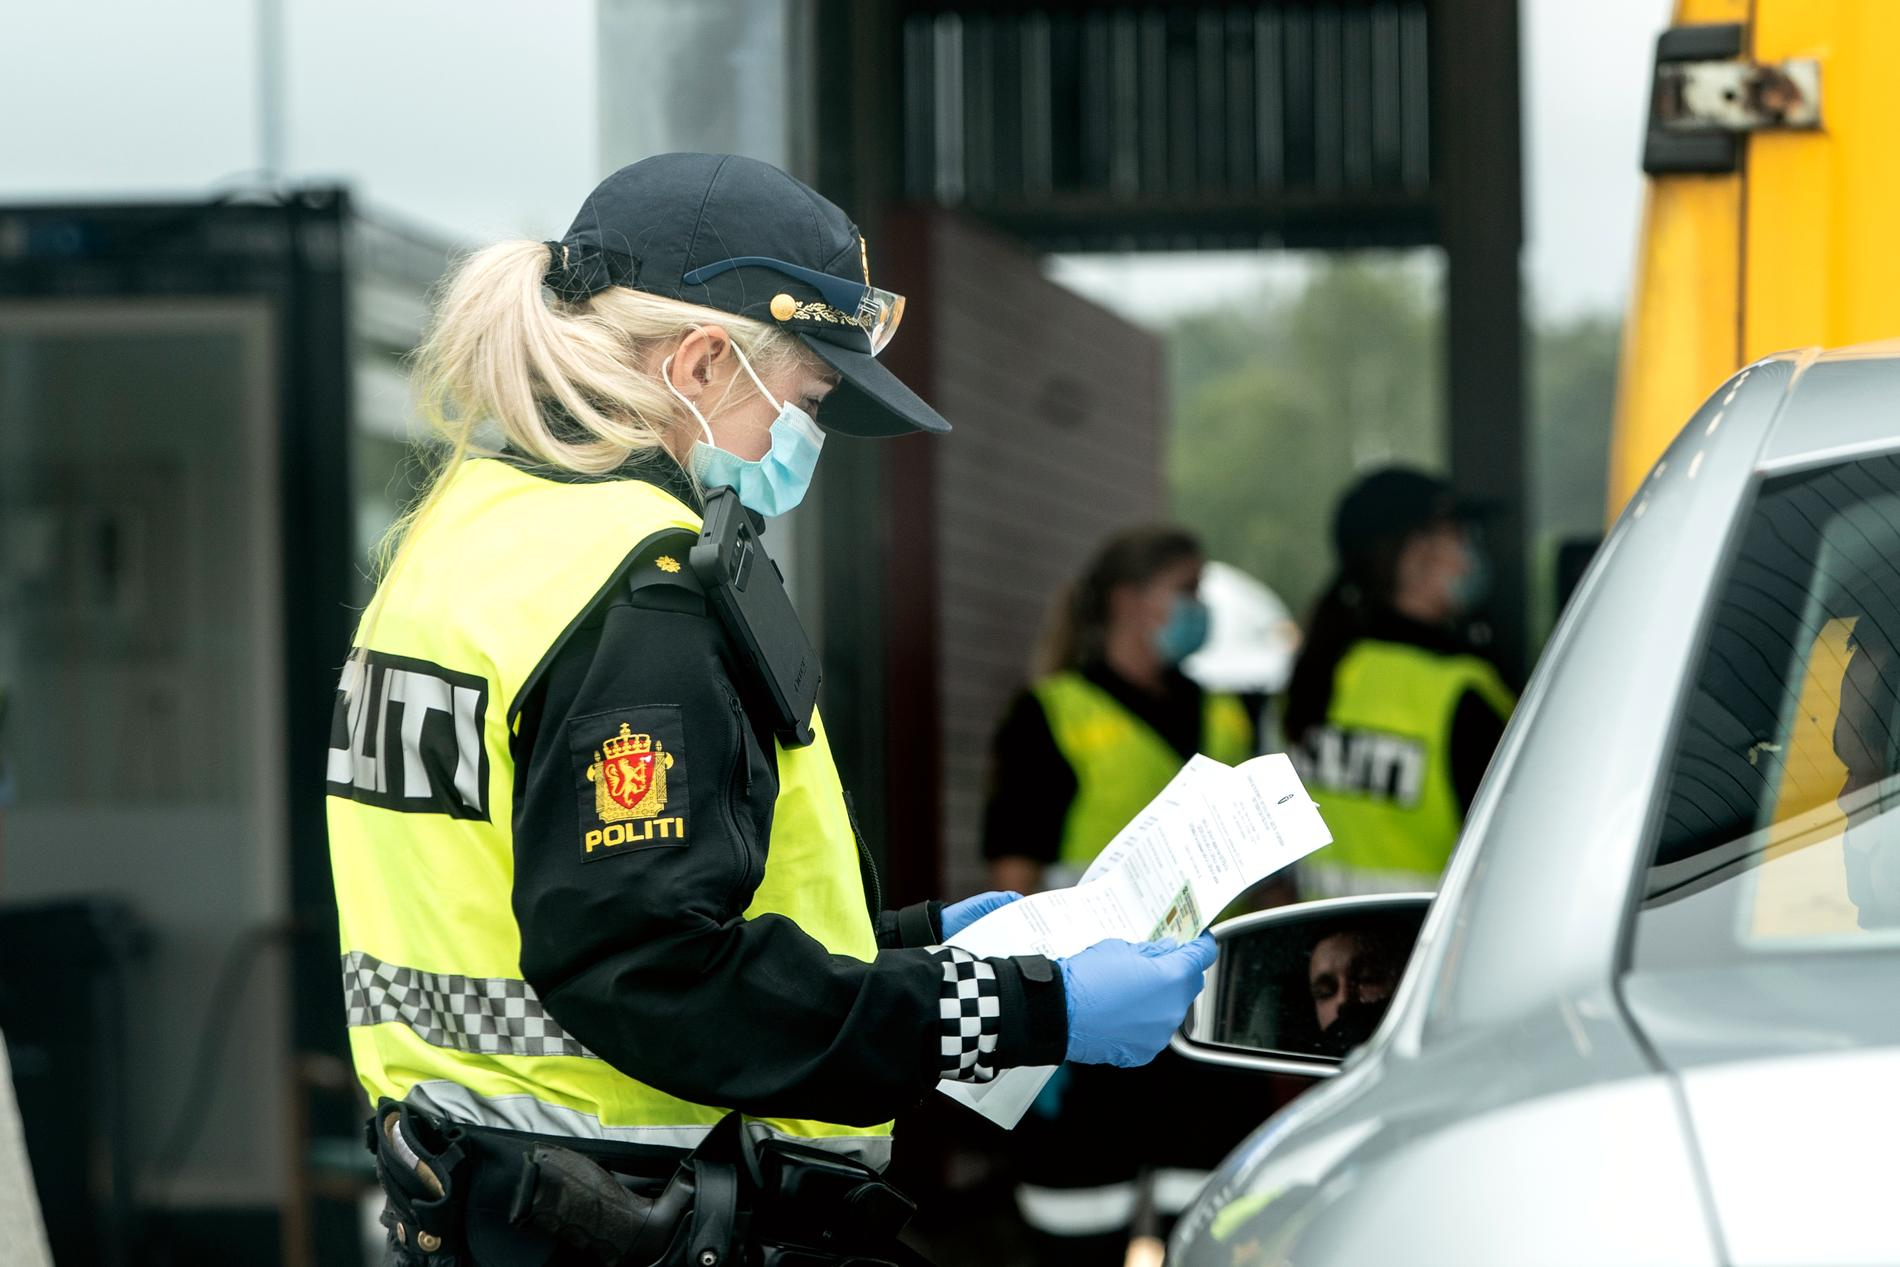 Norsk polis vid gränsen.